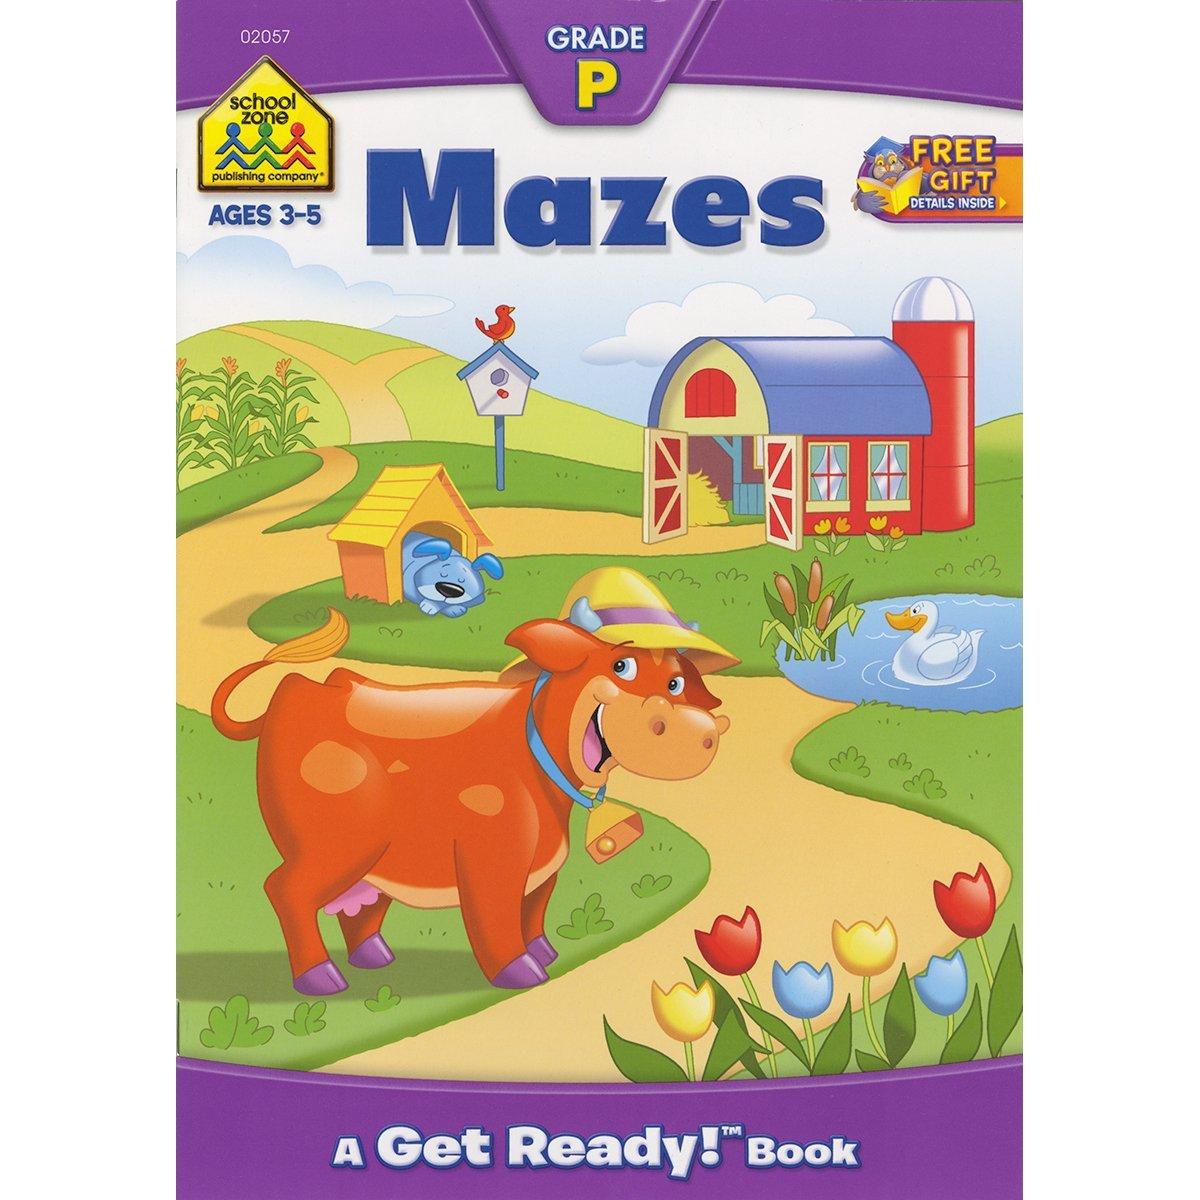 Preschool Workbooks 32 Pages-Mazes by